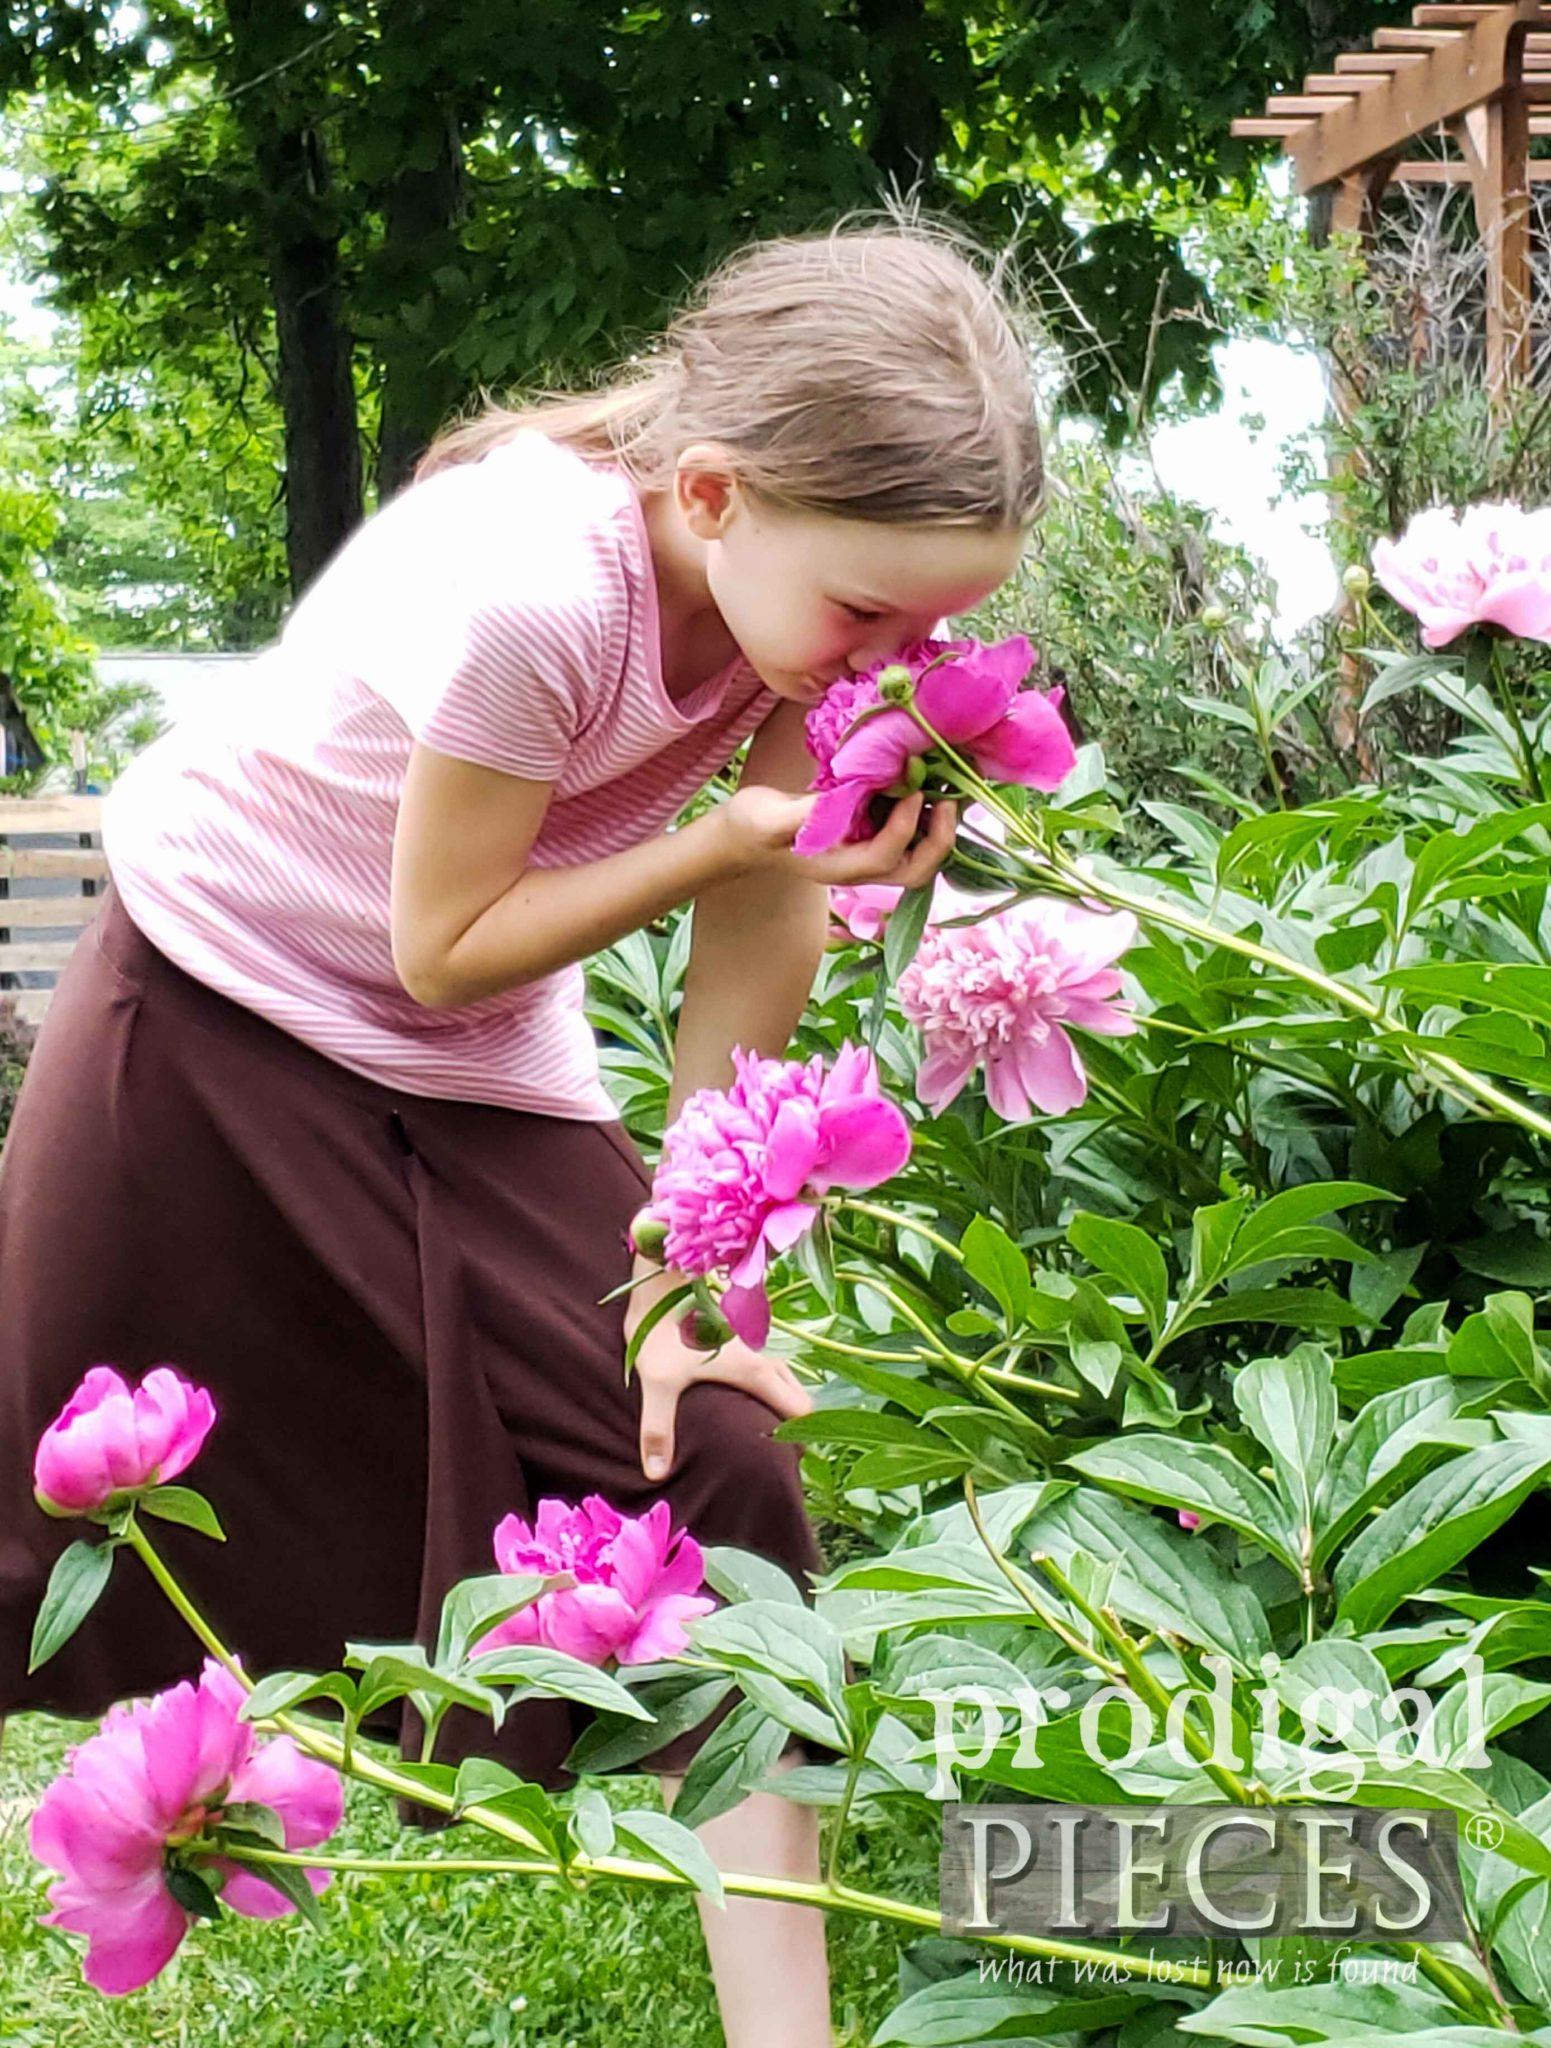 Girl Smelling Peonies | prodigalpieces.com #prodigalpieces #flower #peony #garden